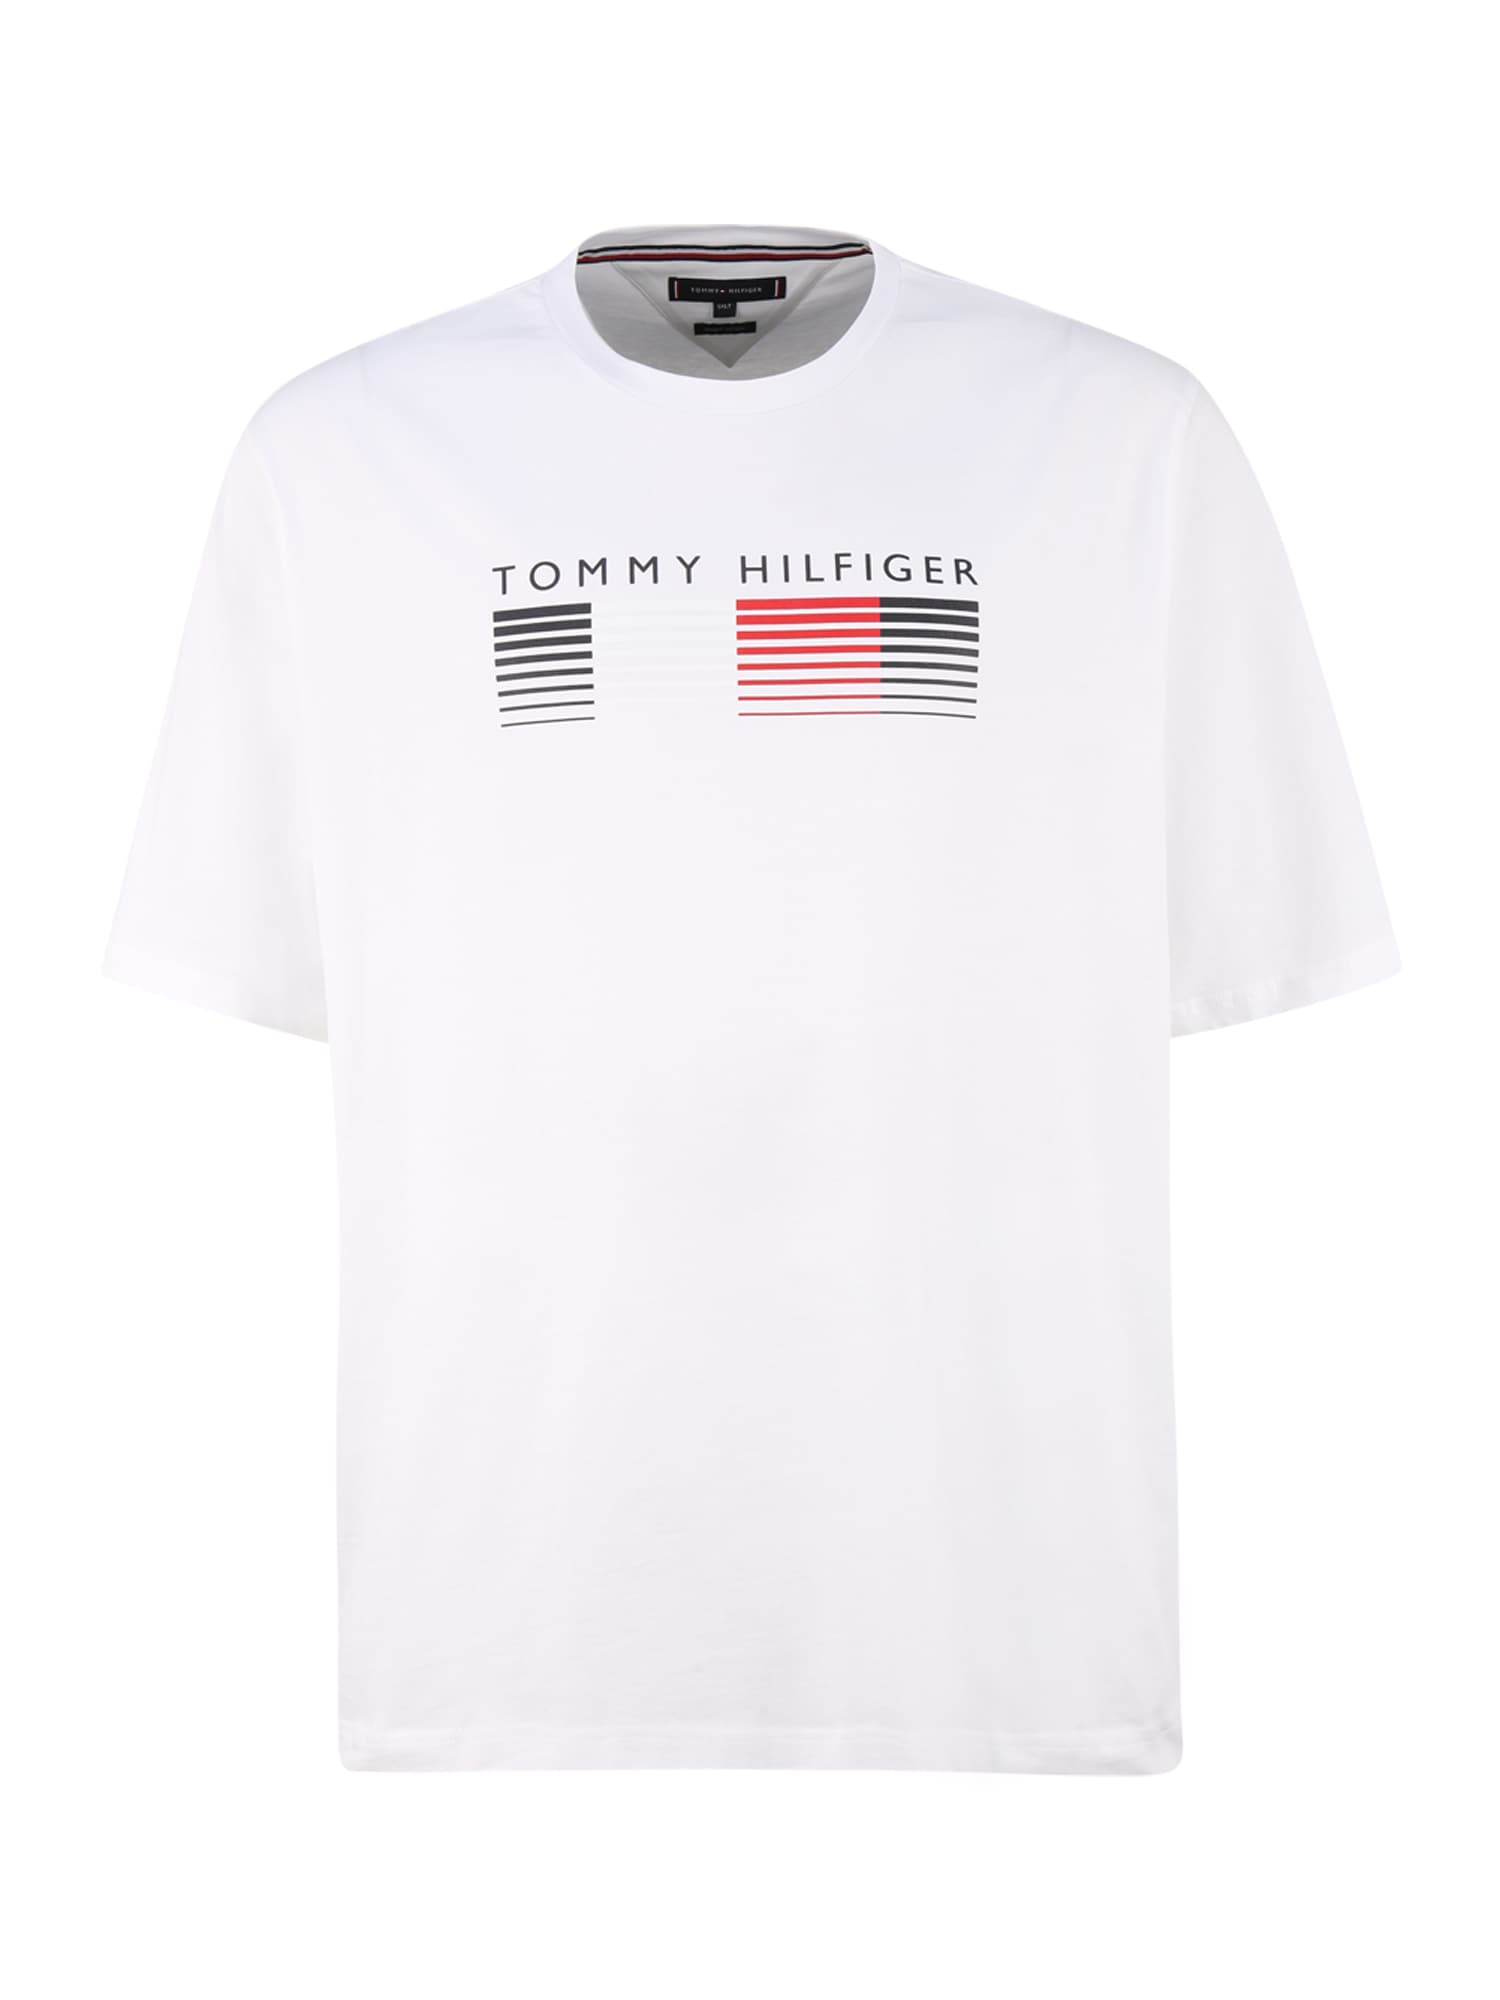 Tommy Hilfiger Big & Tall Marškinėliai balkšva / tamsiai mėlyna / melionų spalva